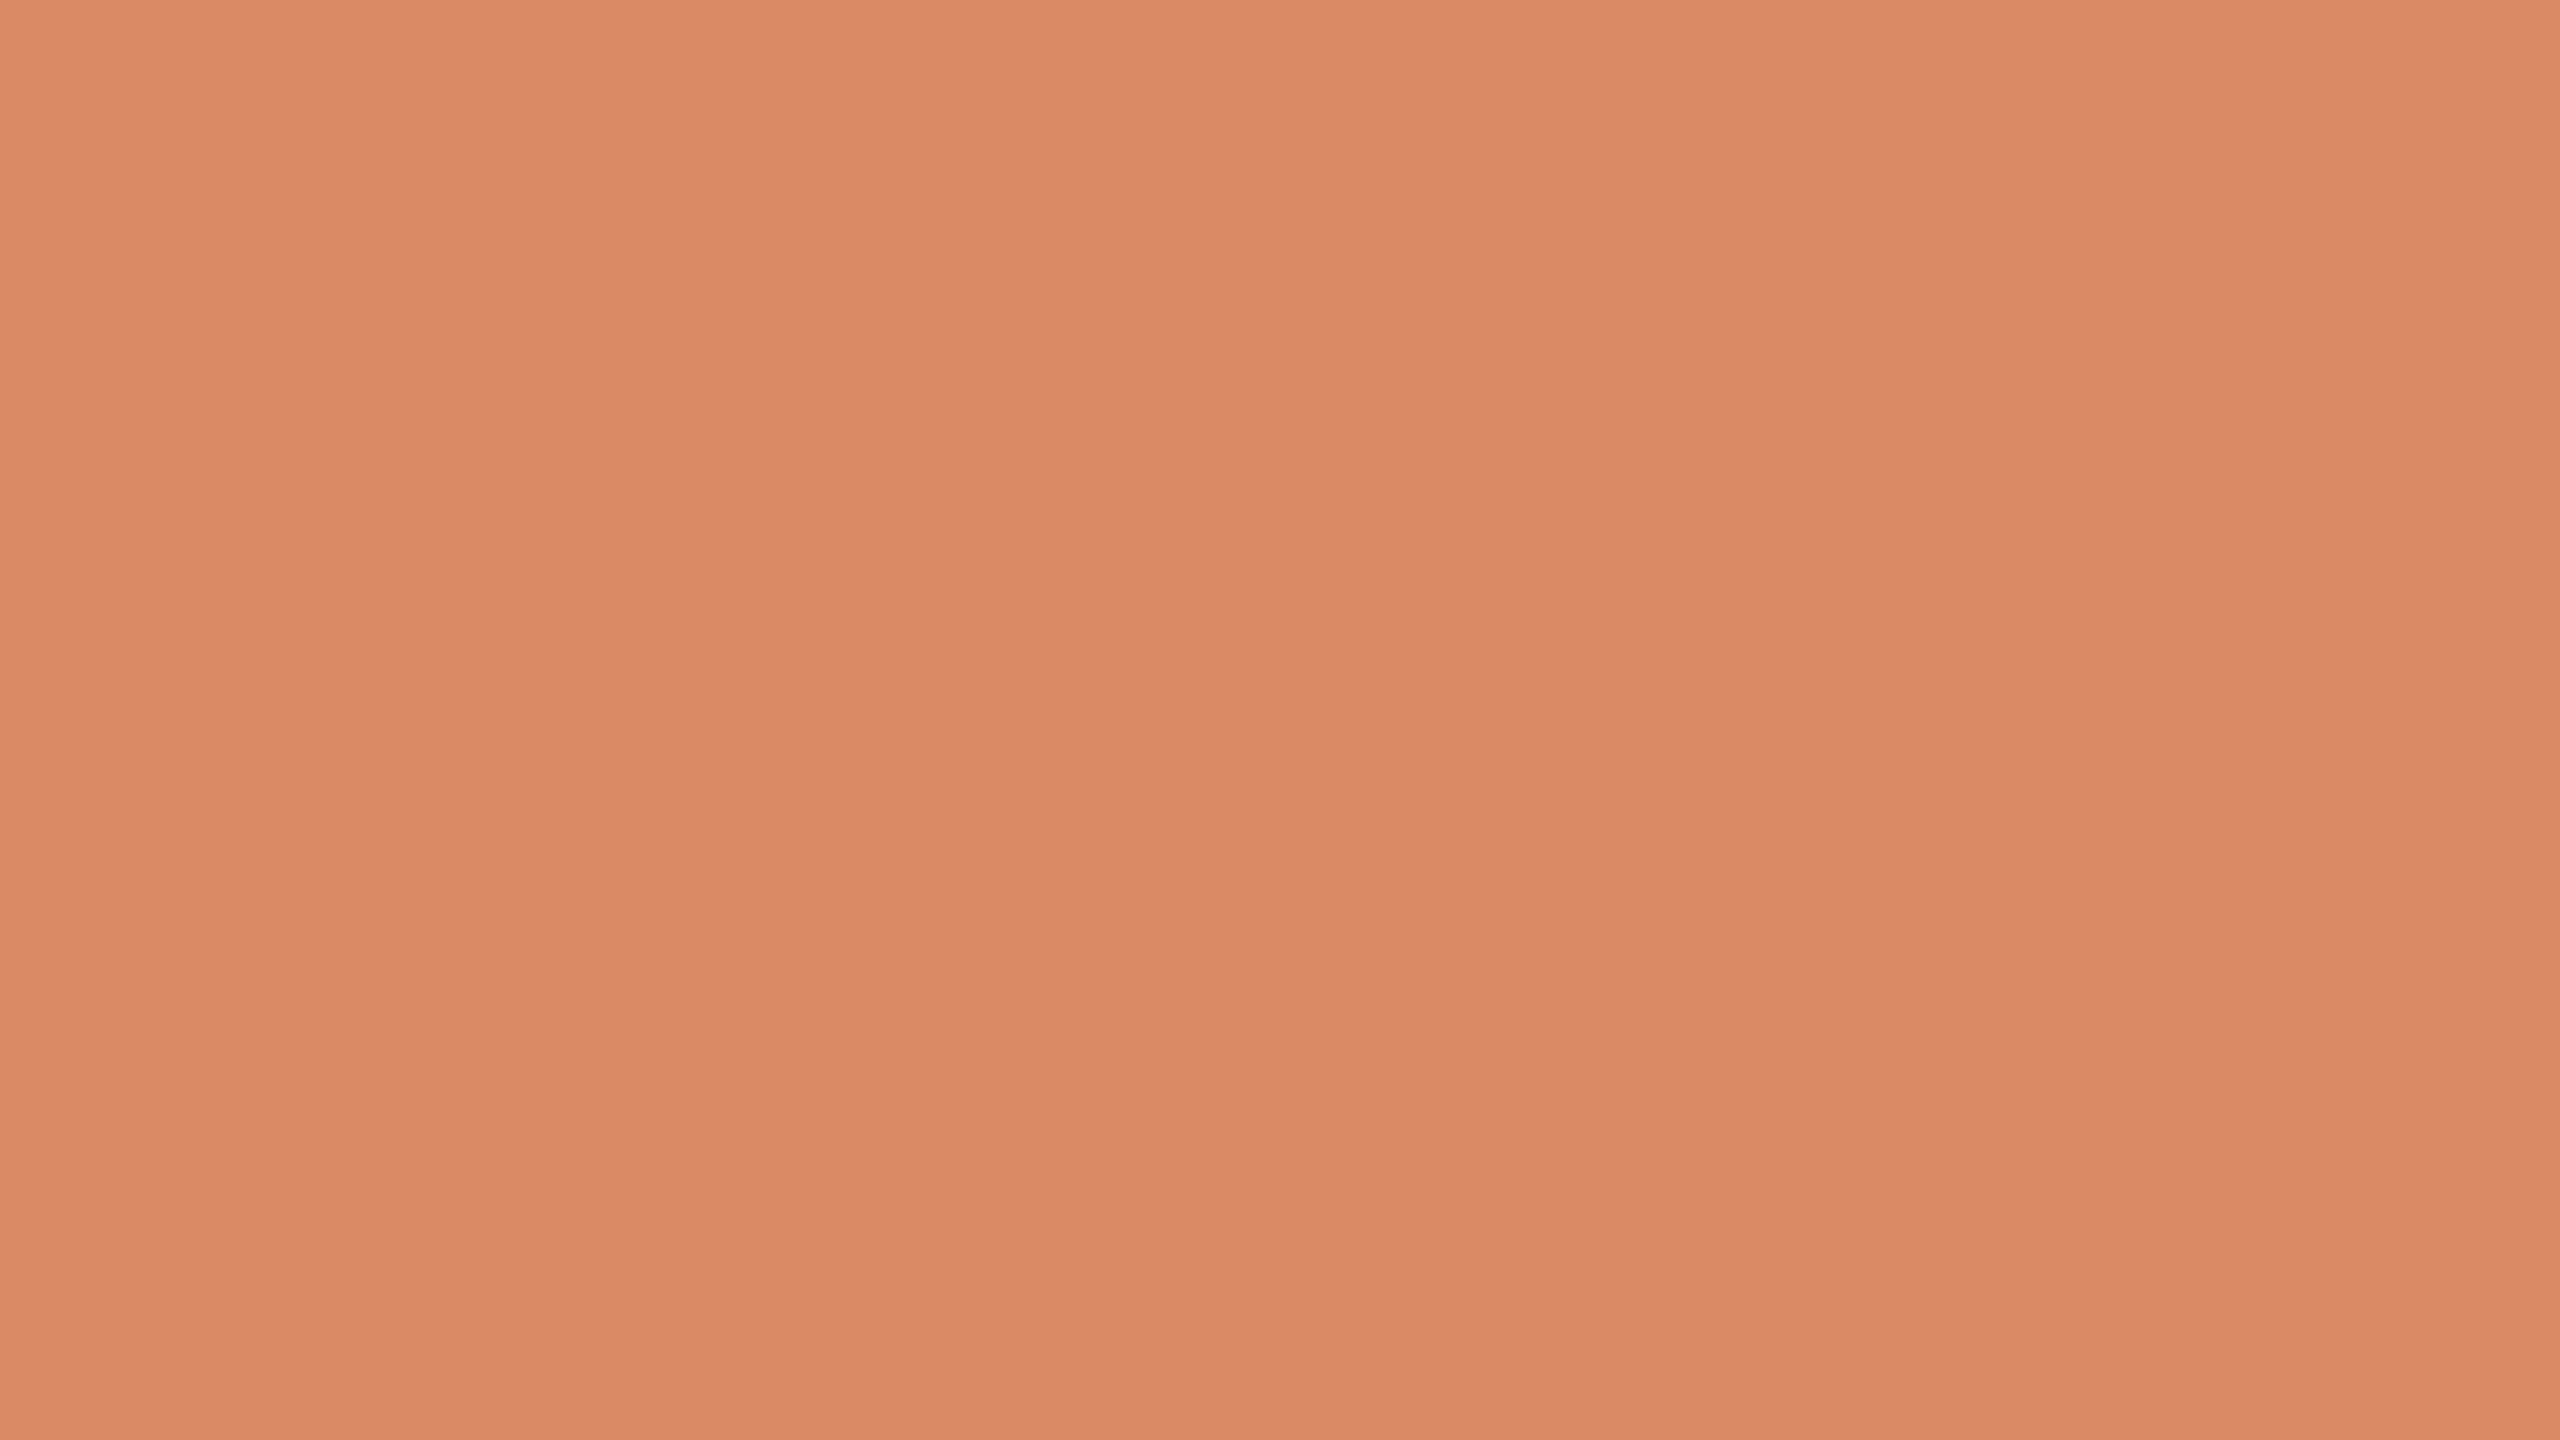 2560x1440 Pale Copper Solid Color Background